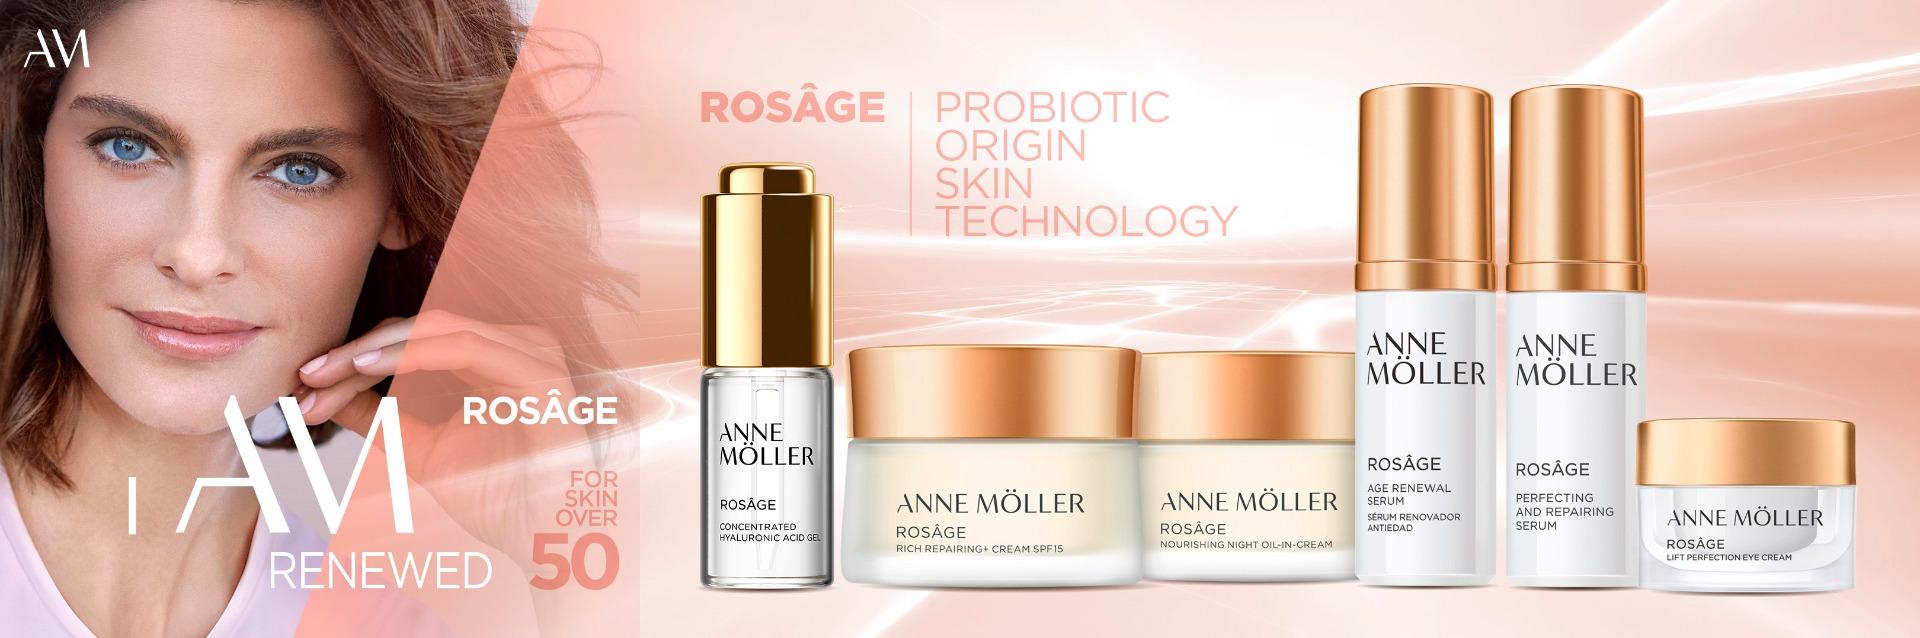 Oferta Anne Moller